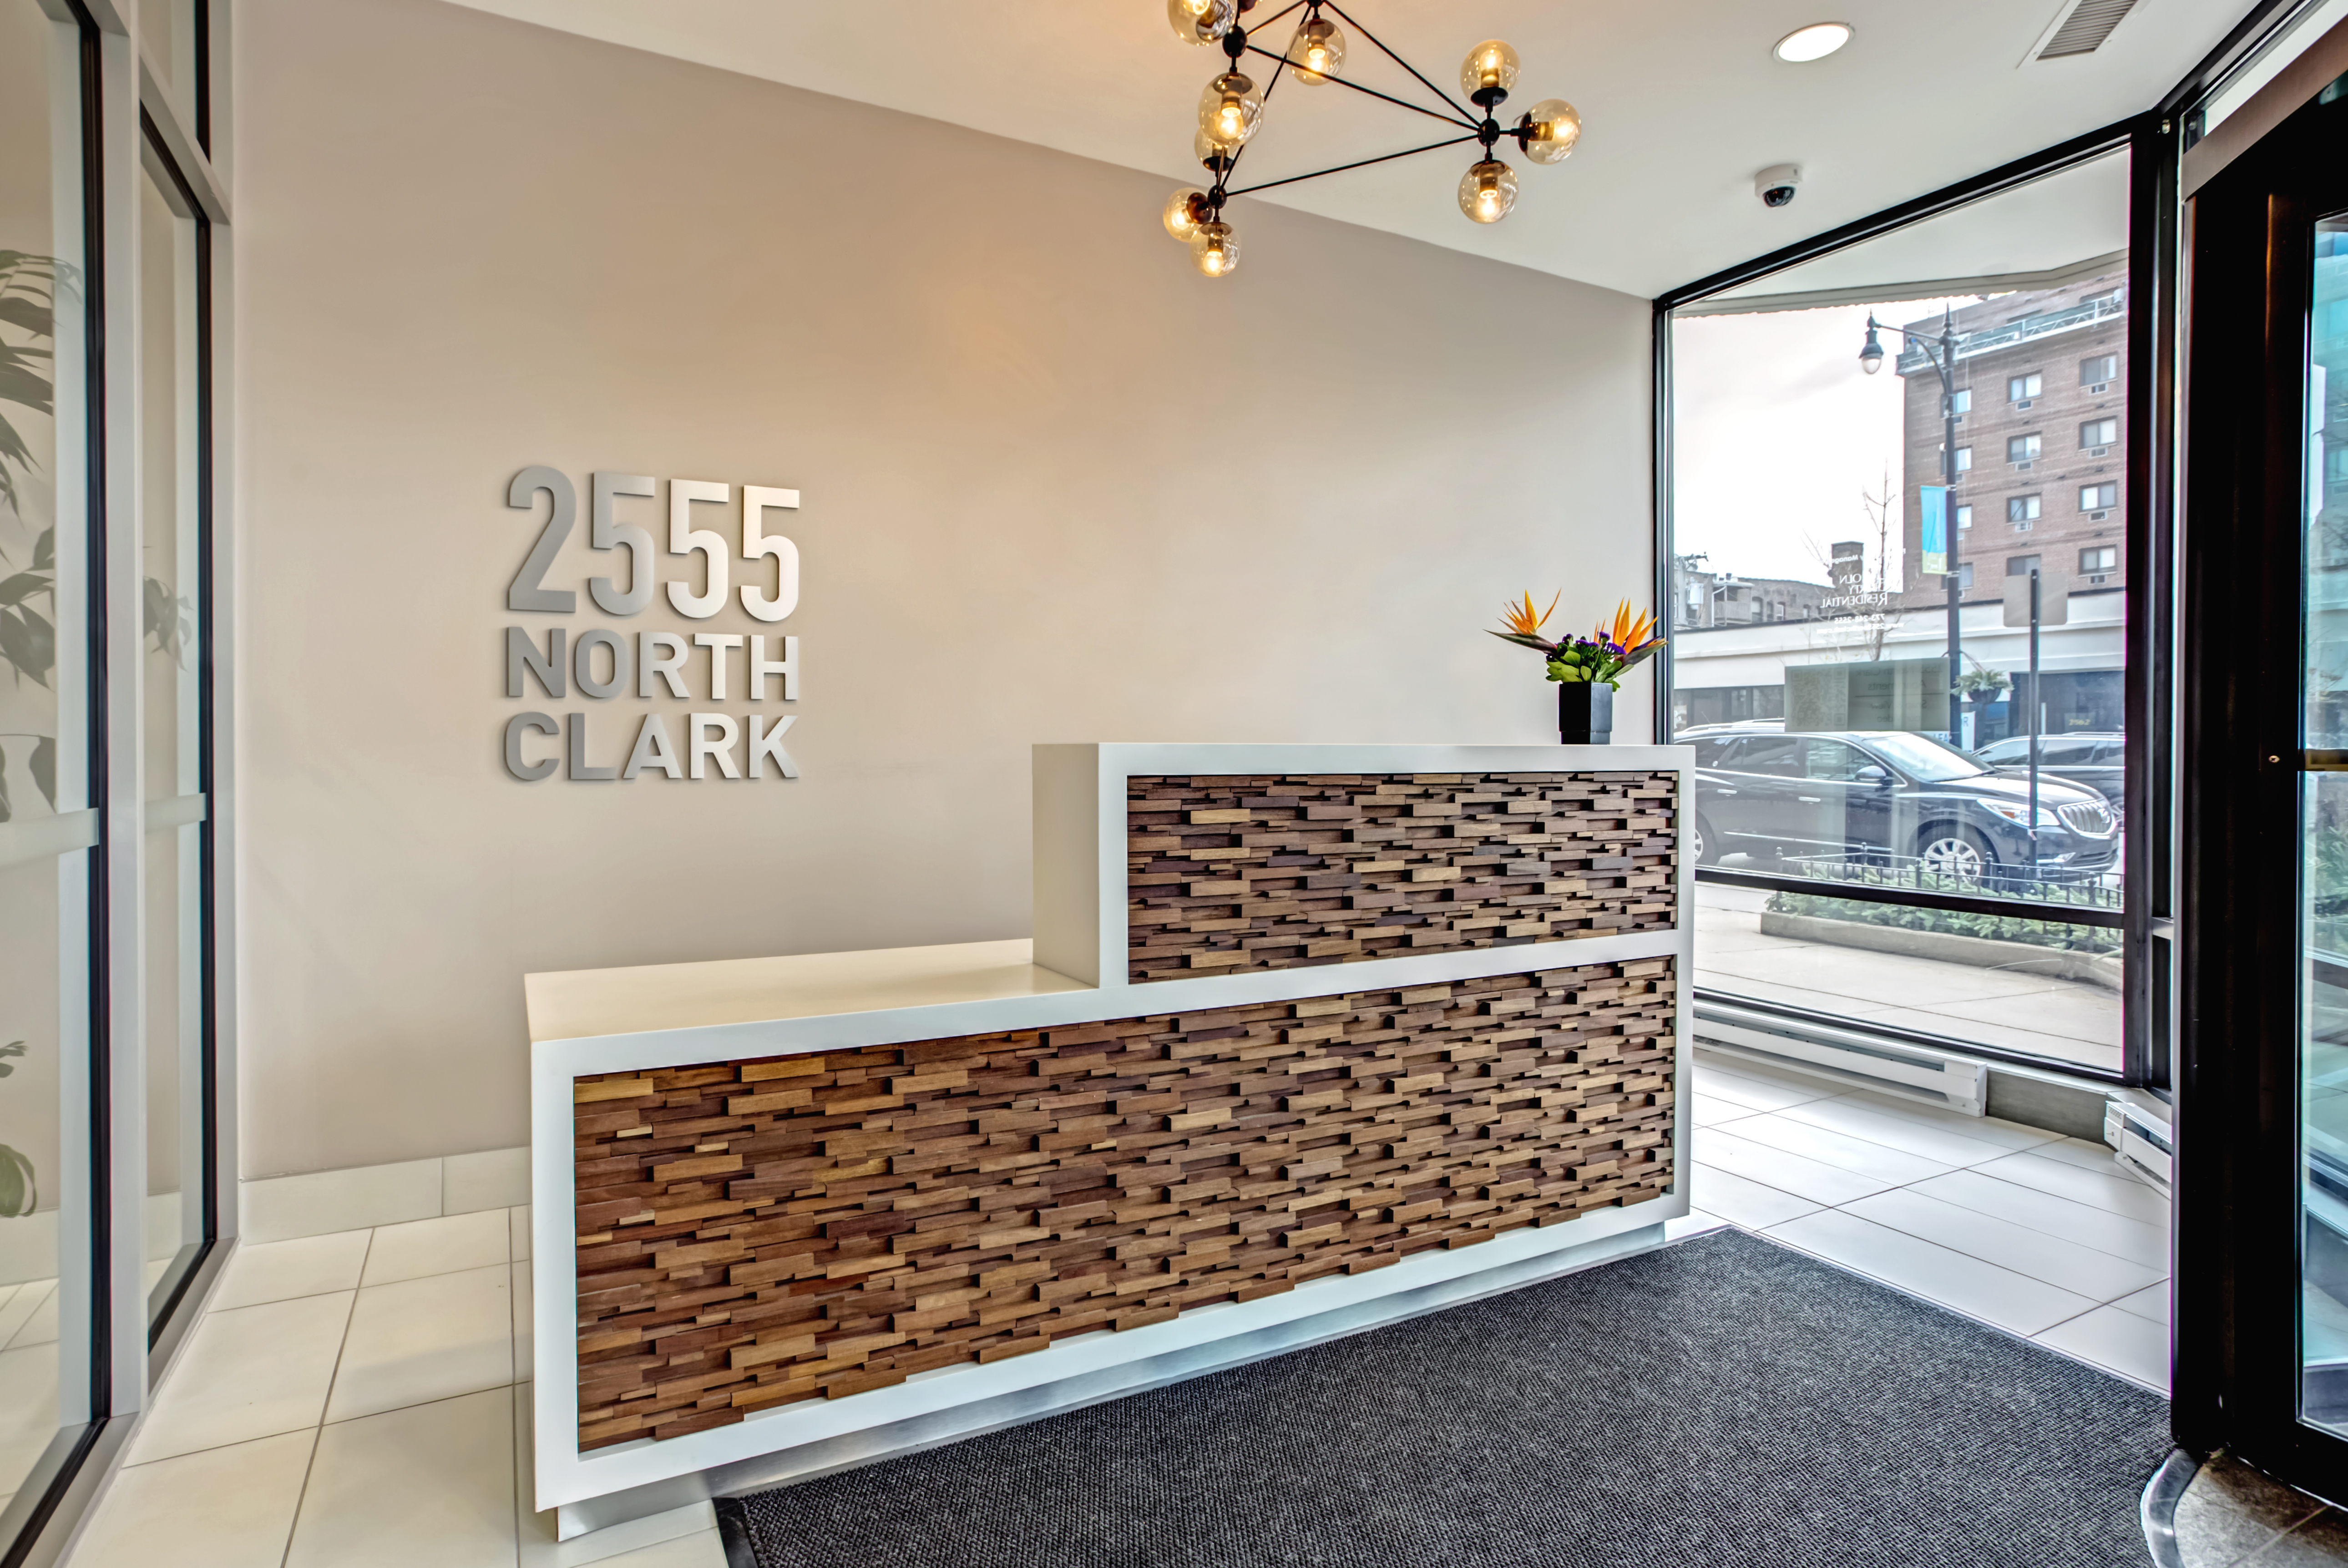 2555 North Clark Street